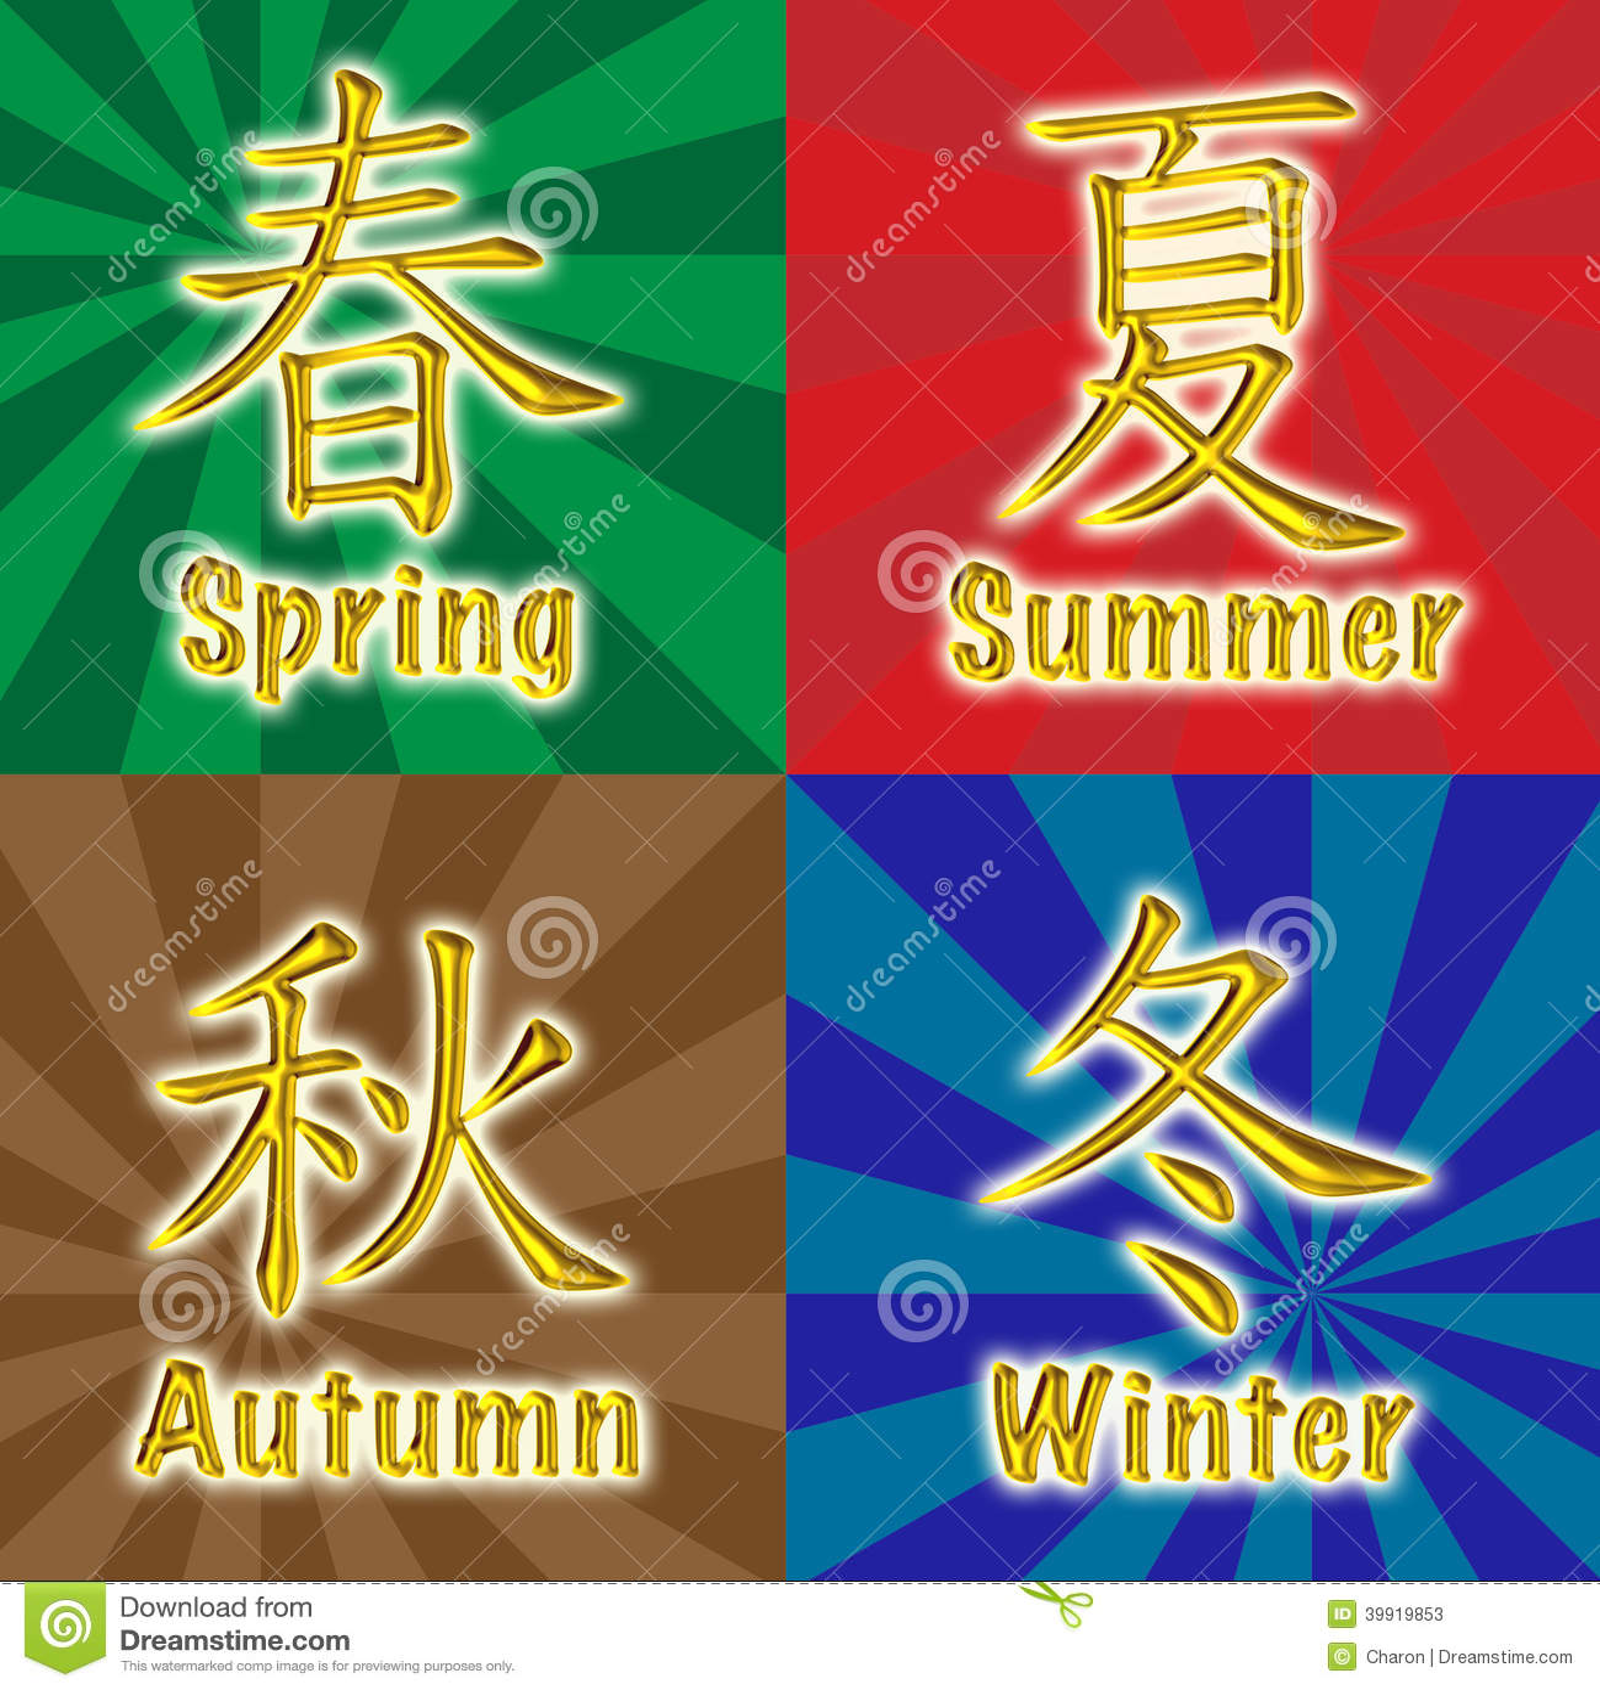 Four Seasons Golden Letters Stock Image